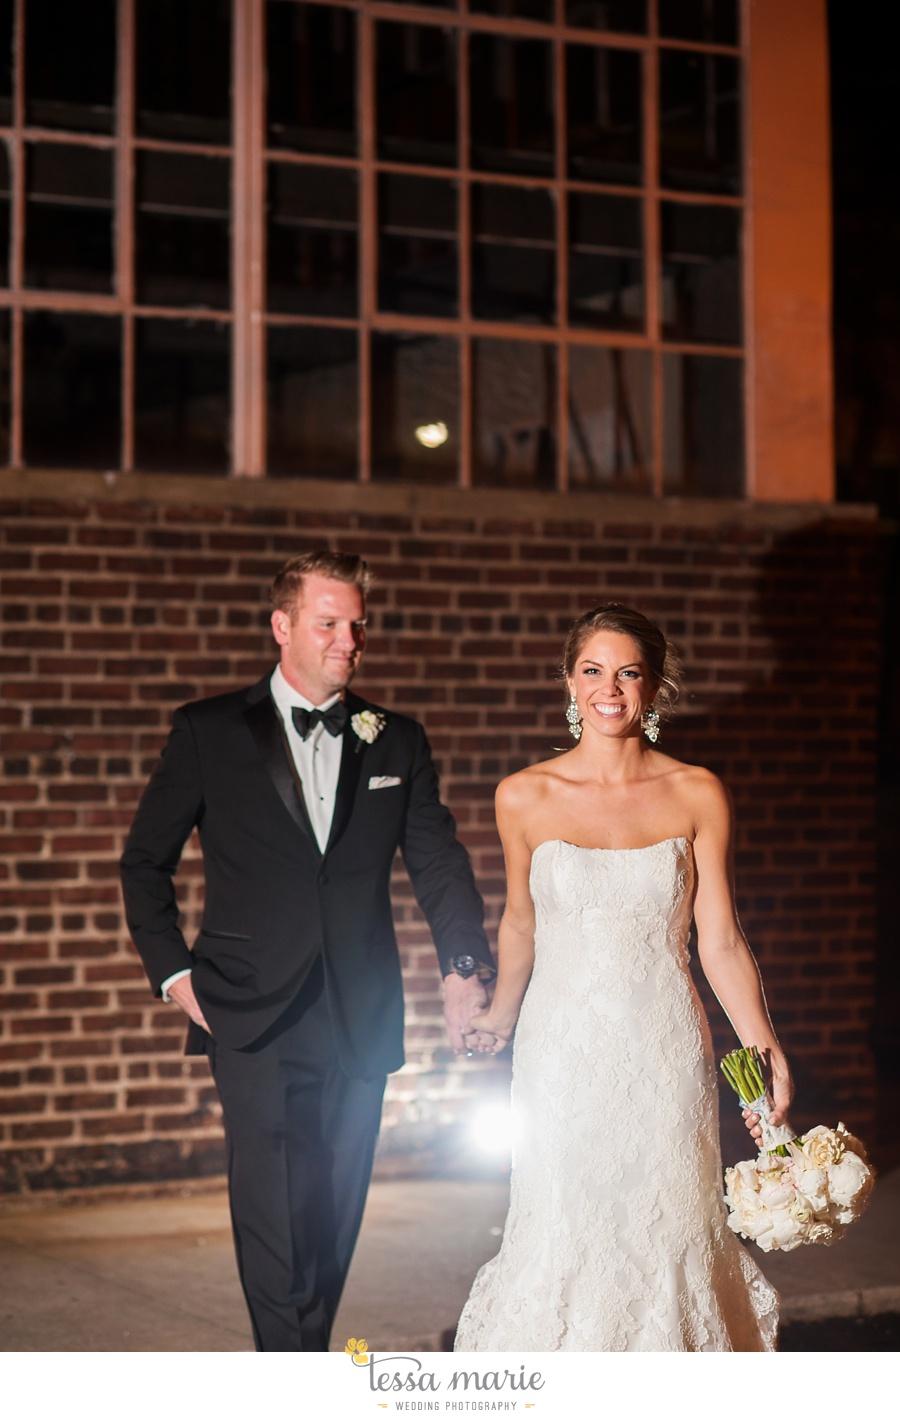 348_tessa_marie_weddings_emotional_moments_photography_king_low_wedding_sam_neil_best_atlanta_wedding_photographer